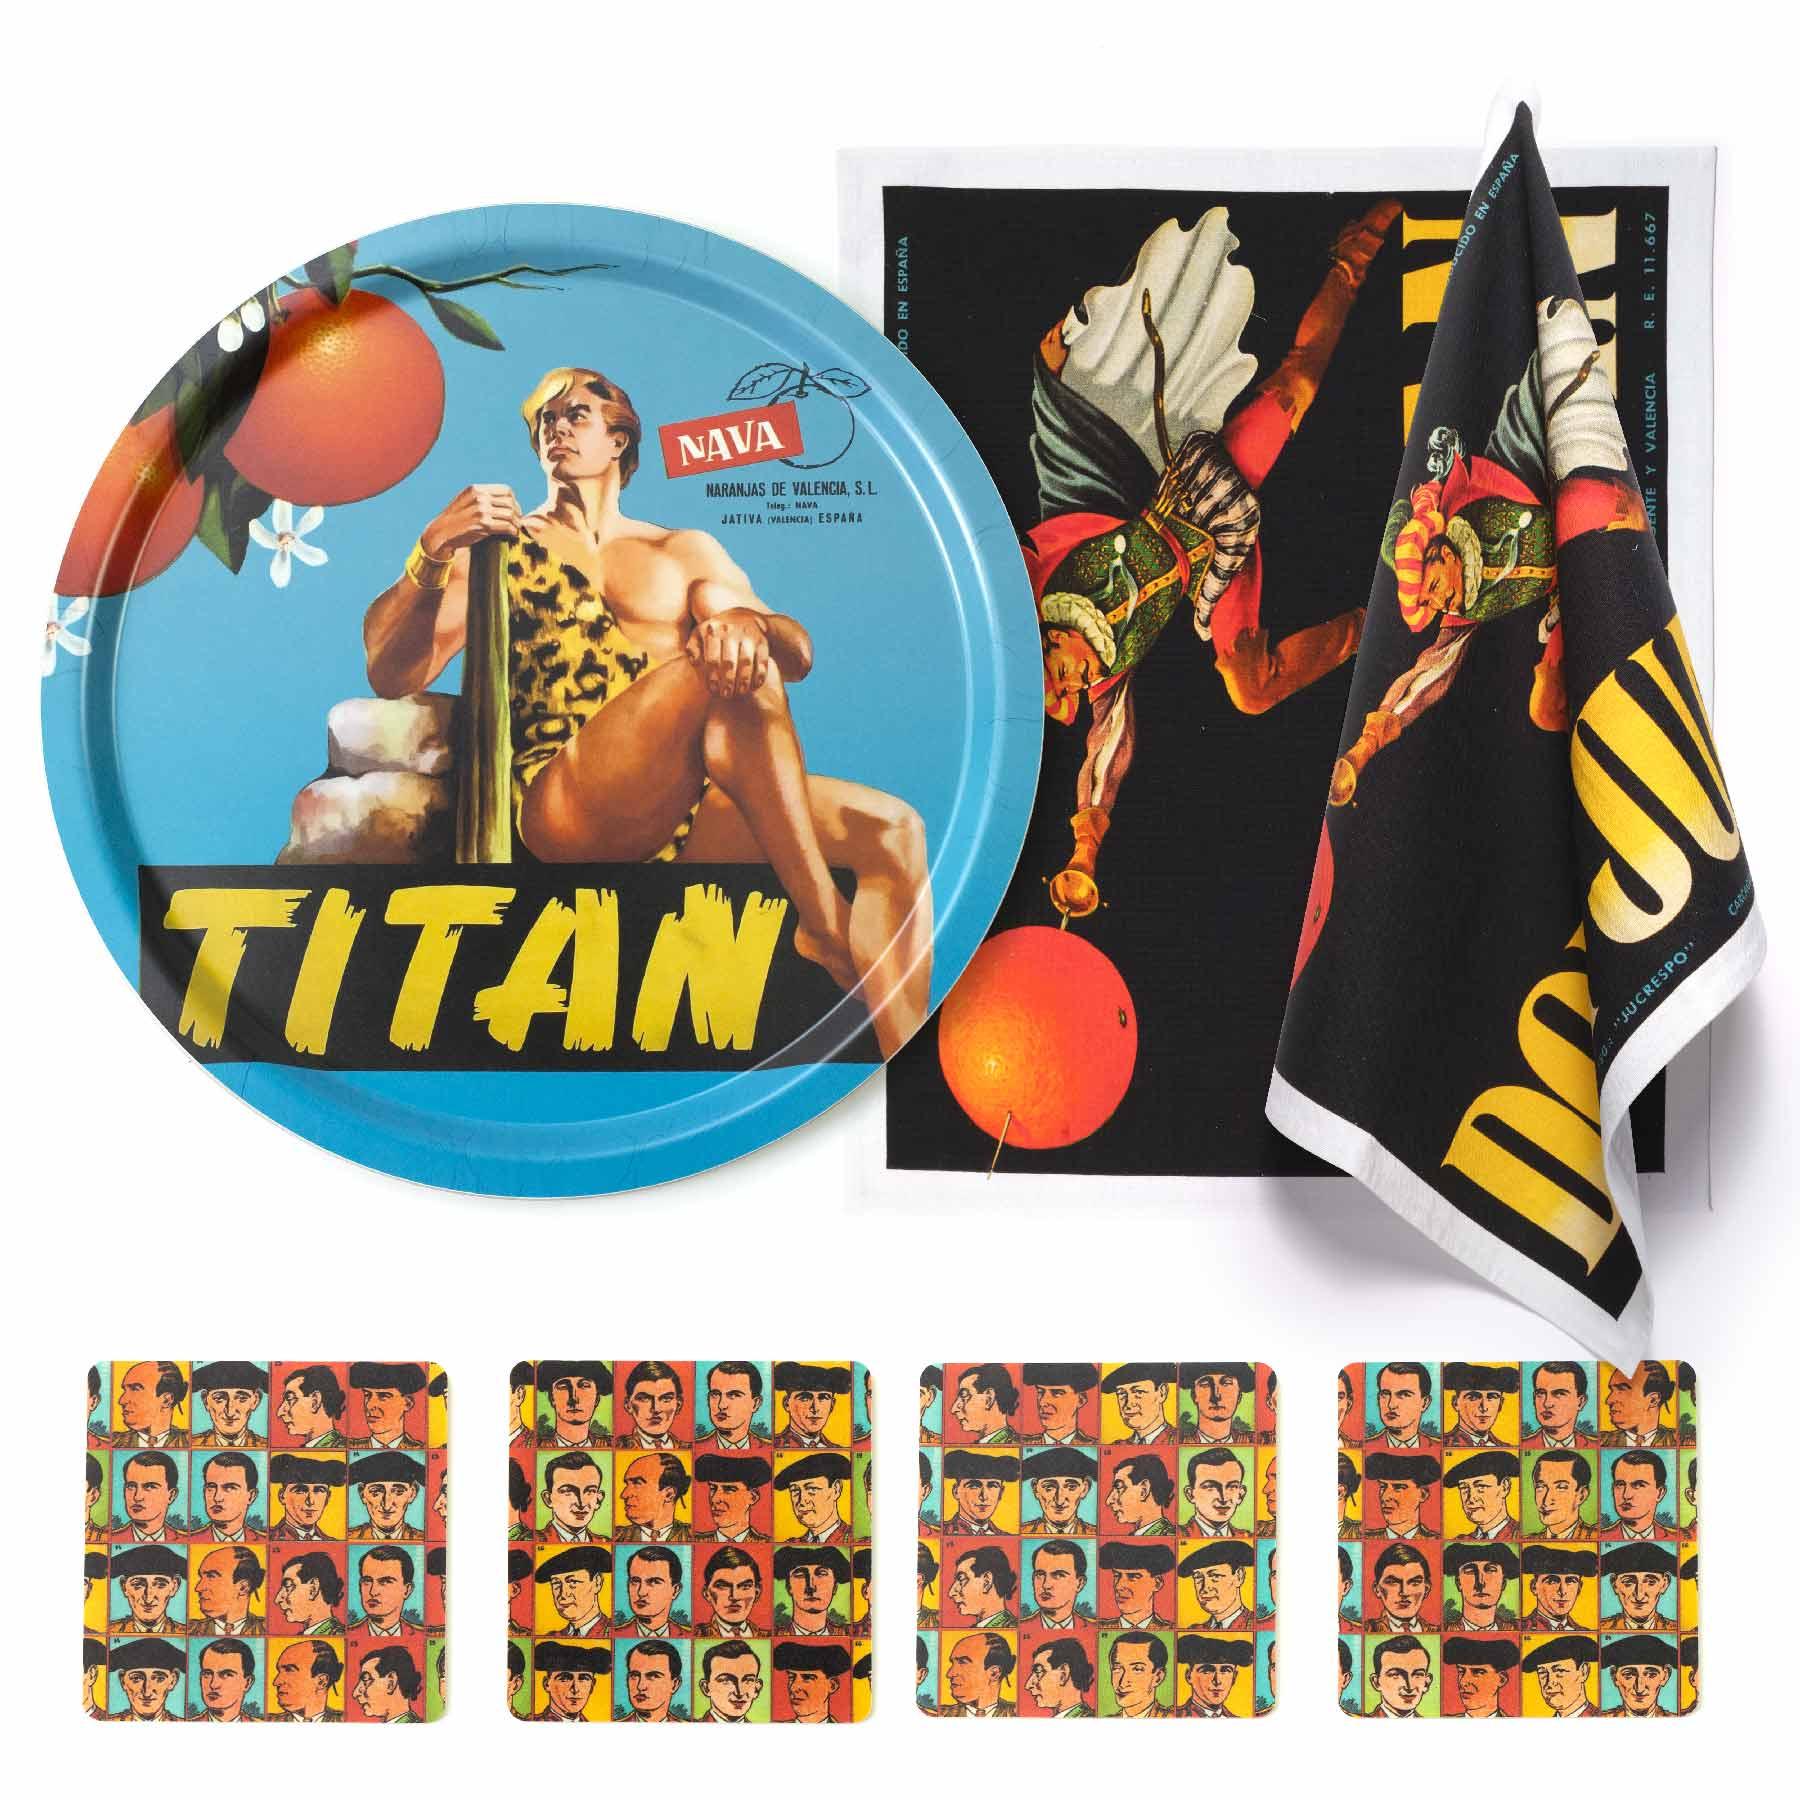 Decorative Trays | Retro Trays | Trays Gifts